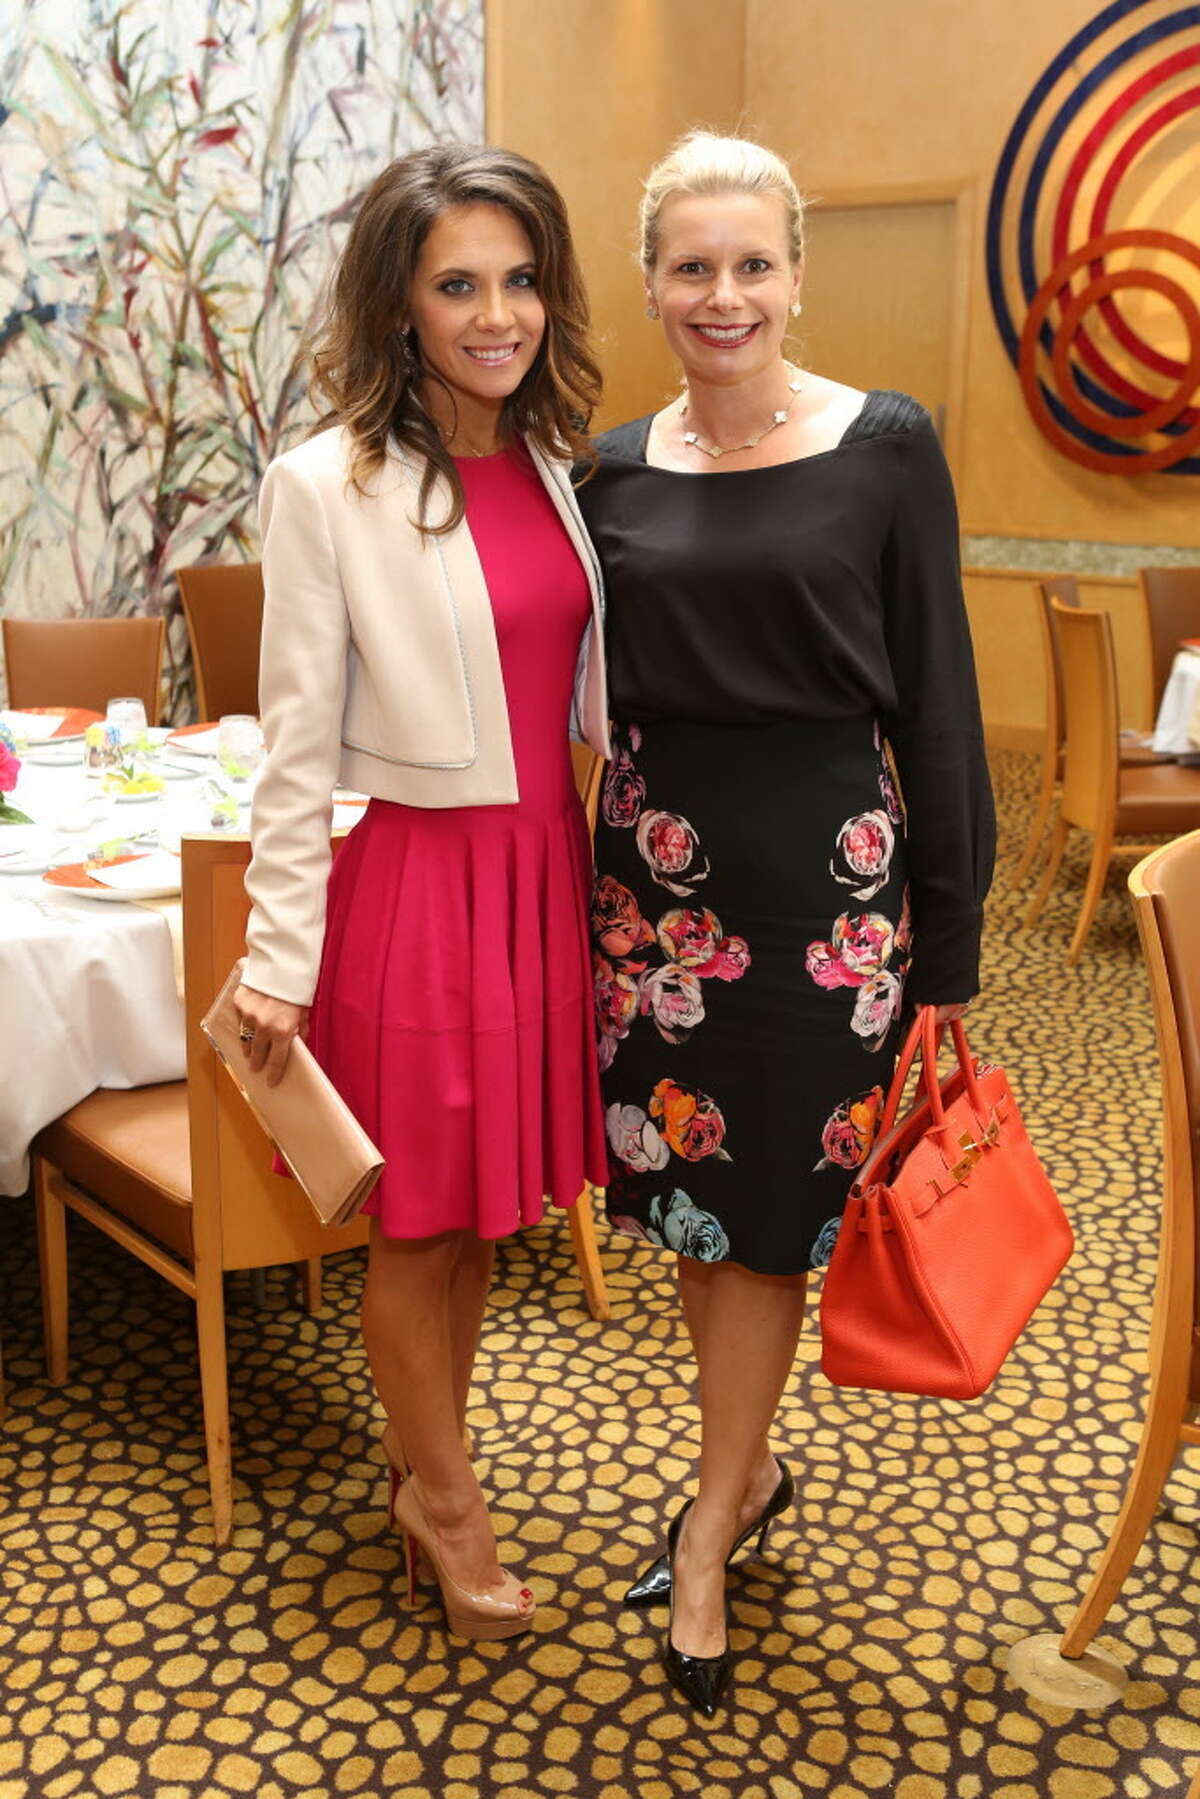 Joanna Marks and Valerie Dieterich